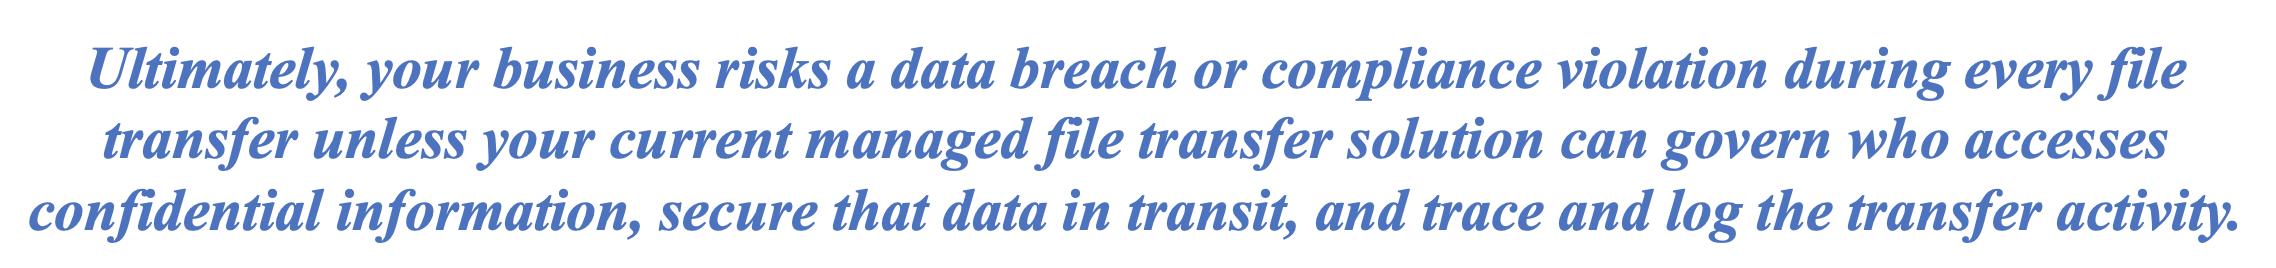 Modern Secure Managed File Transfer Solution